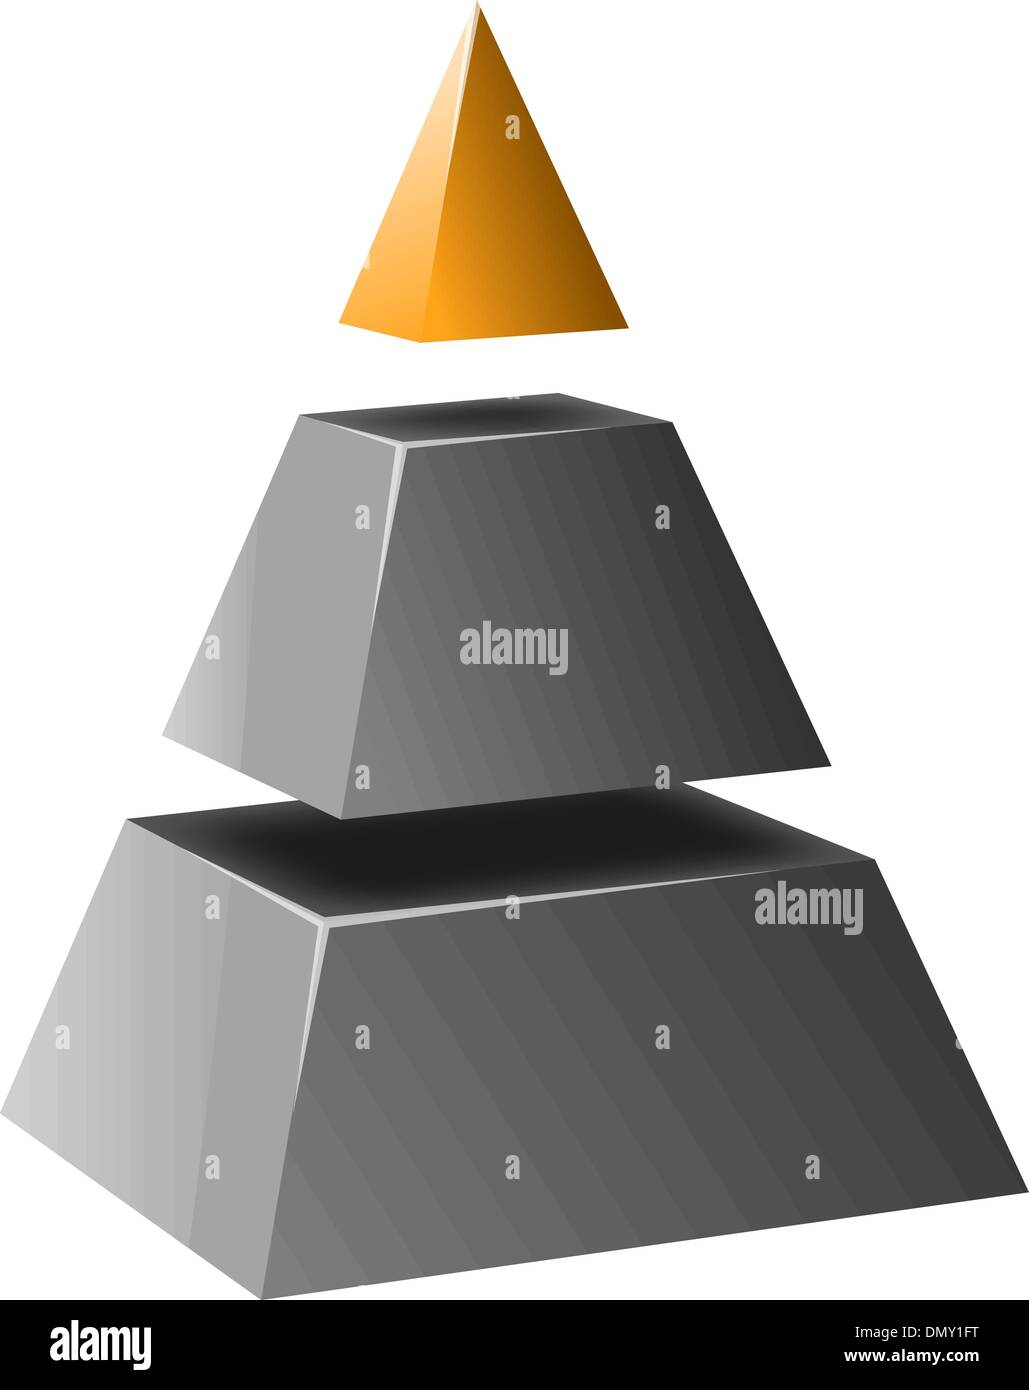 Business Performance Pyramid Stock Photos & Business Performance ...